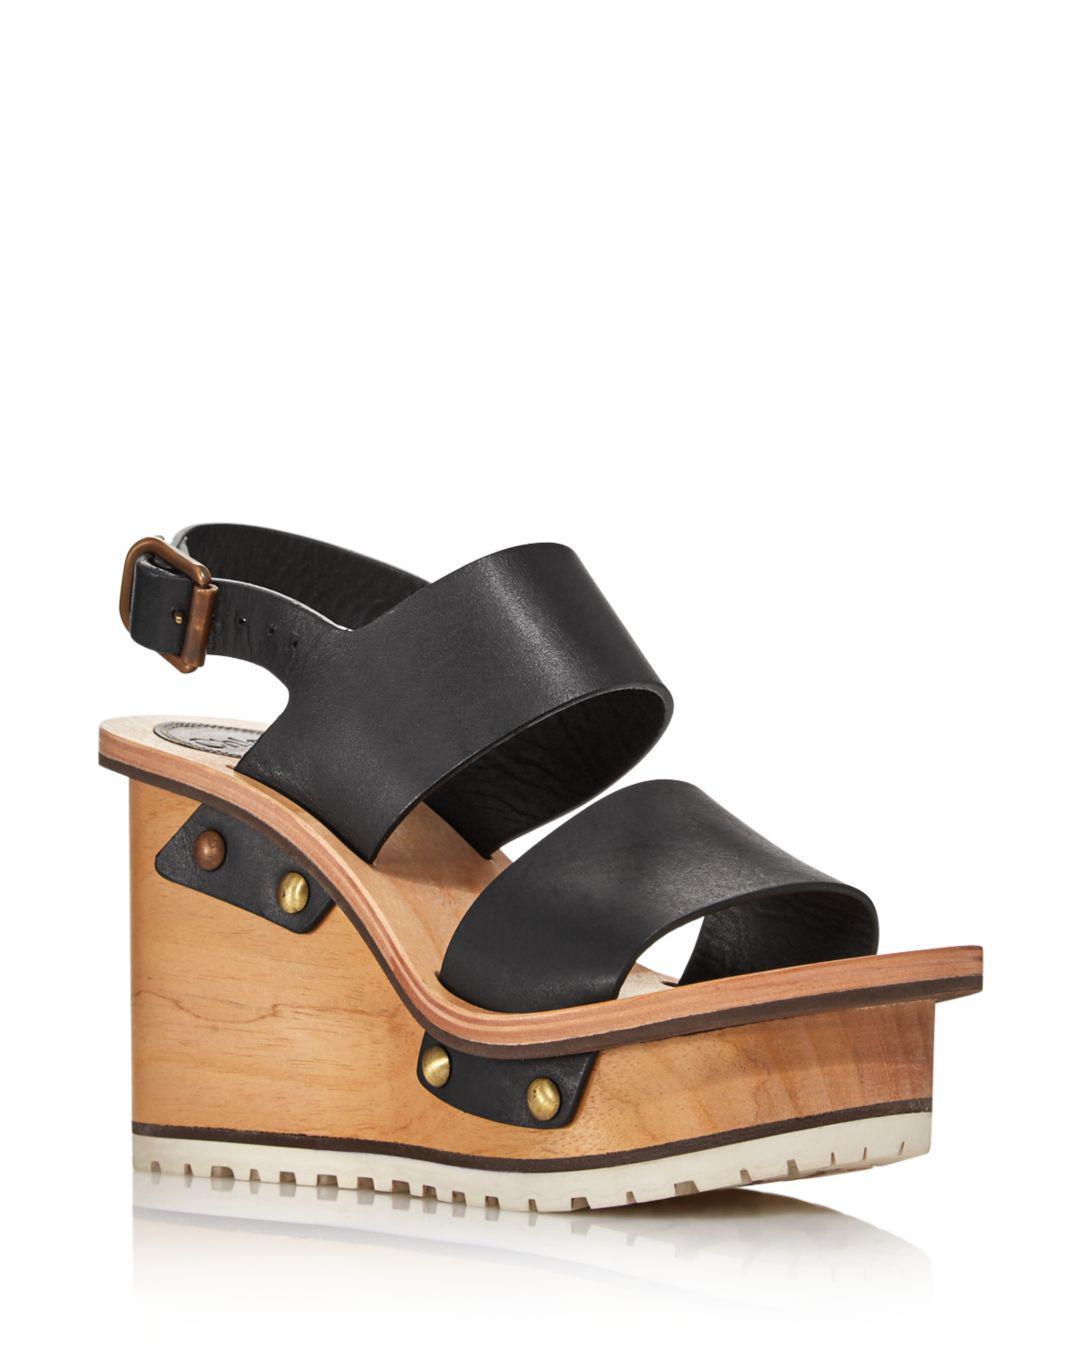 d4a4add56a54 Chloé - Black Women s Valentine Platform Wedge Sandals - Lyst. View  fullscreen